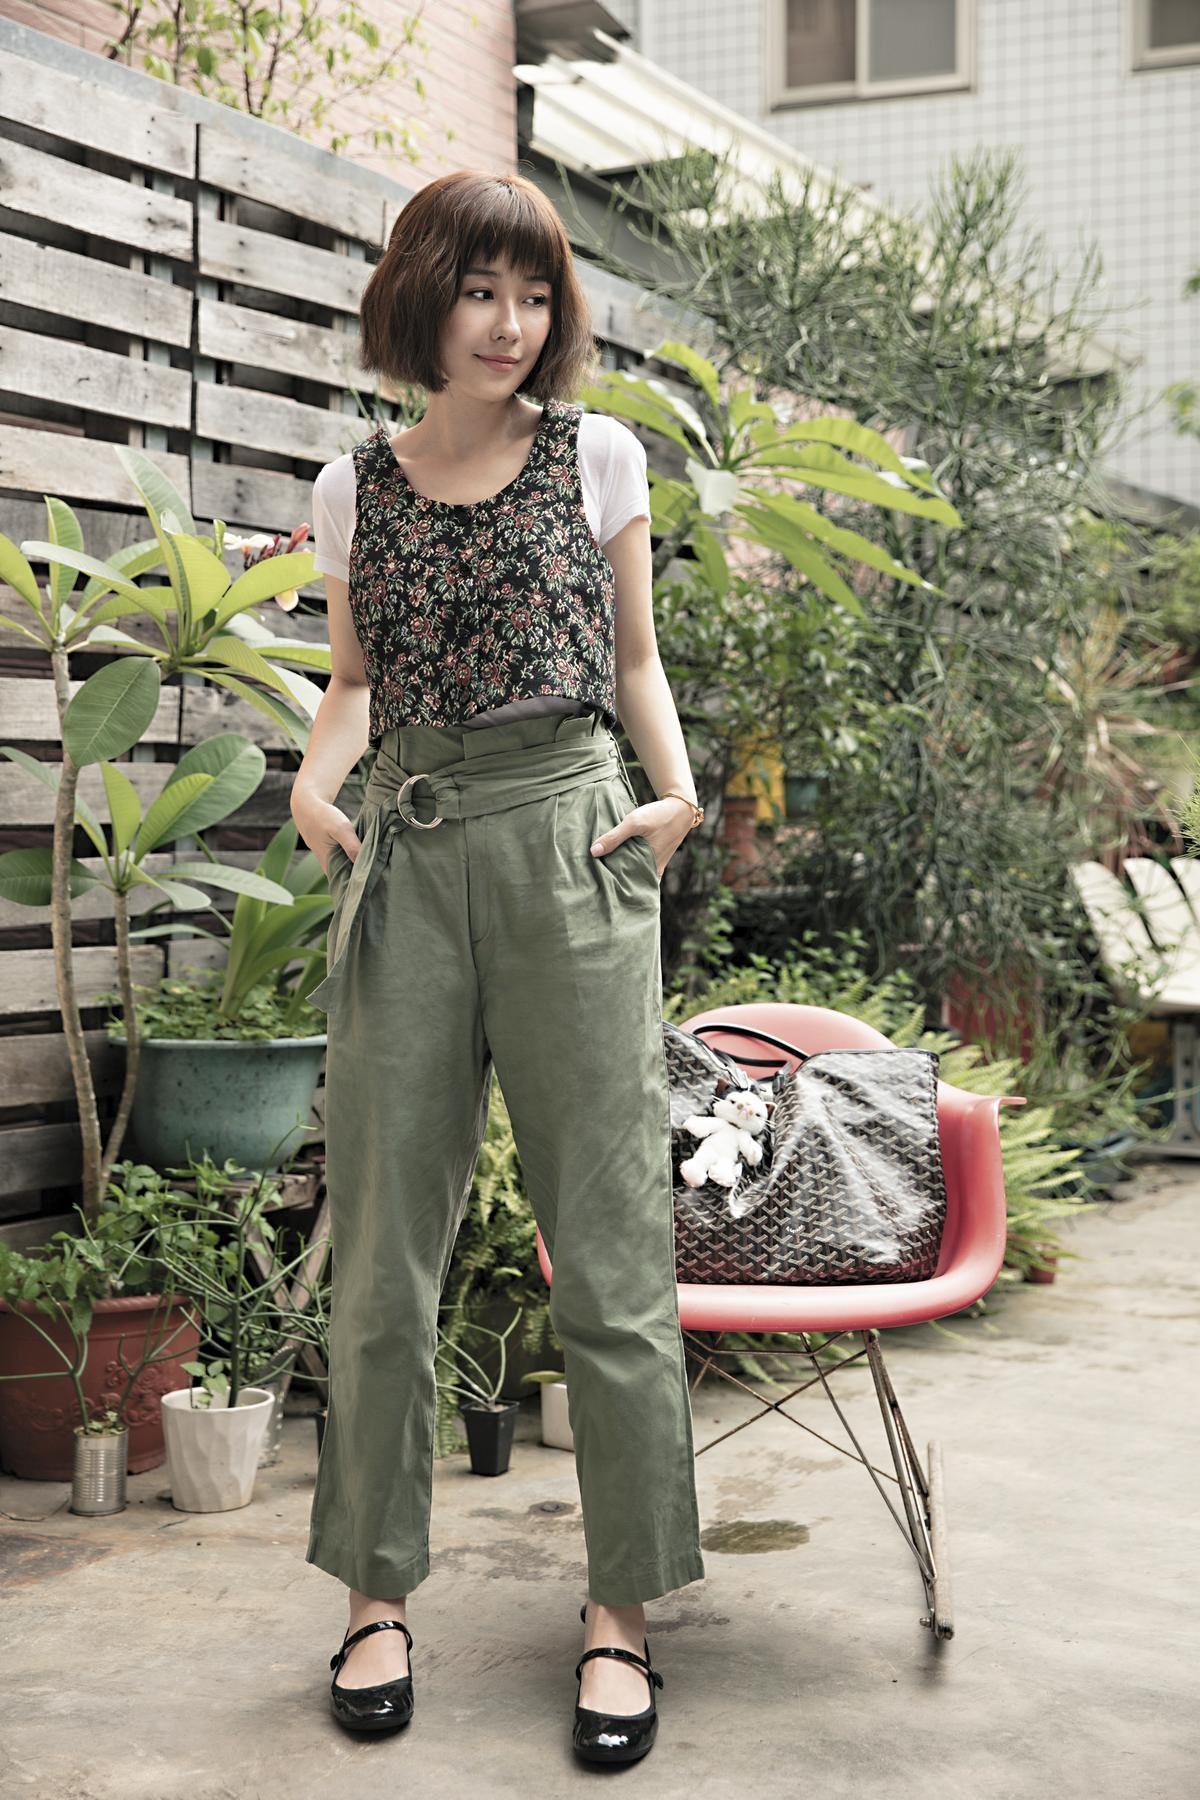 Ray Beams白色T-Shirt,約NT$1,000;Theopen Product碎花背心,約NT$2,000;DAYRAN綠色棉質寬版褲,約NT$1,600;GOYARD購物袋,約NT$50,000;repetto娃娃鞋,約NT$12,000。